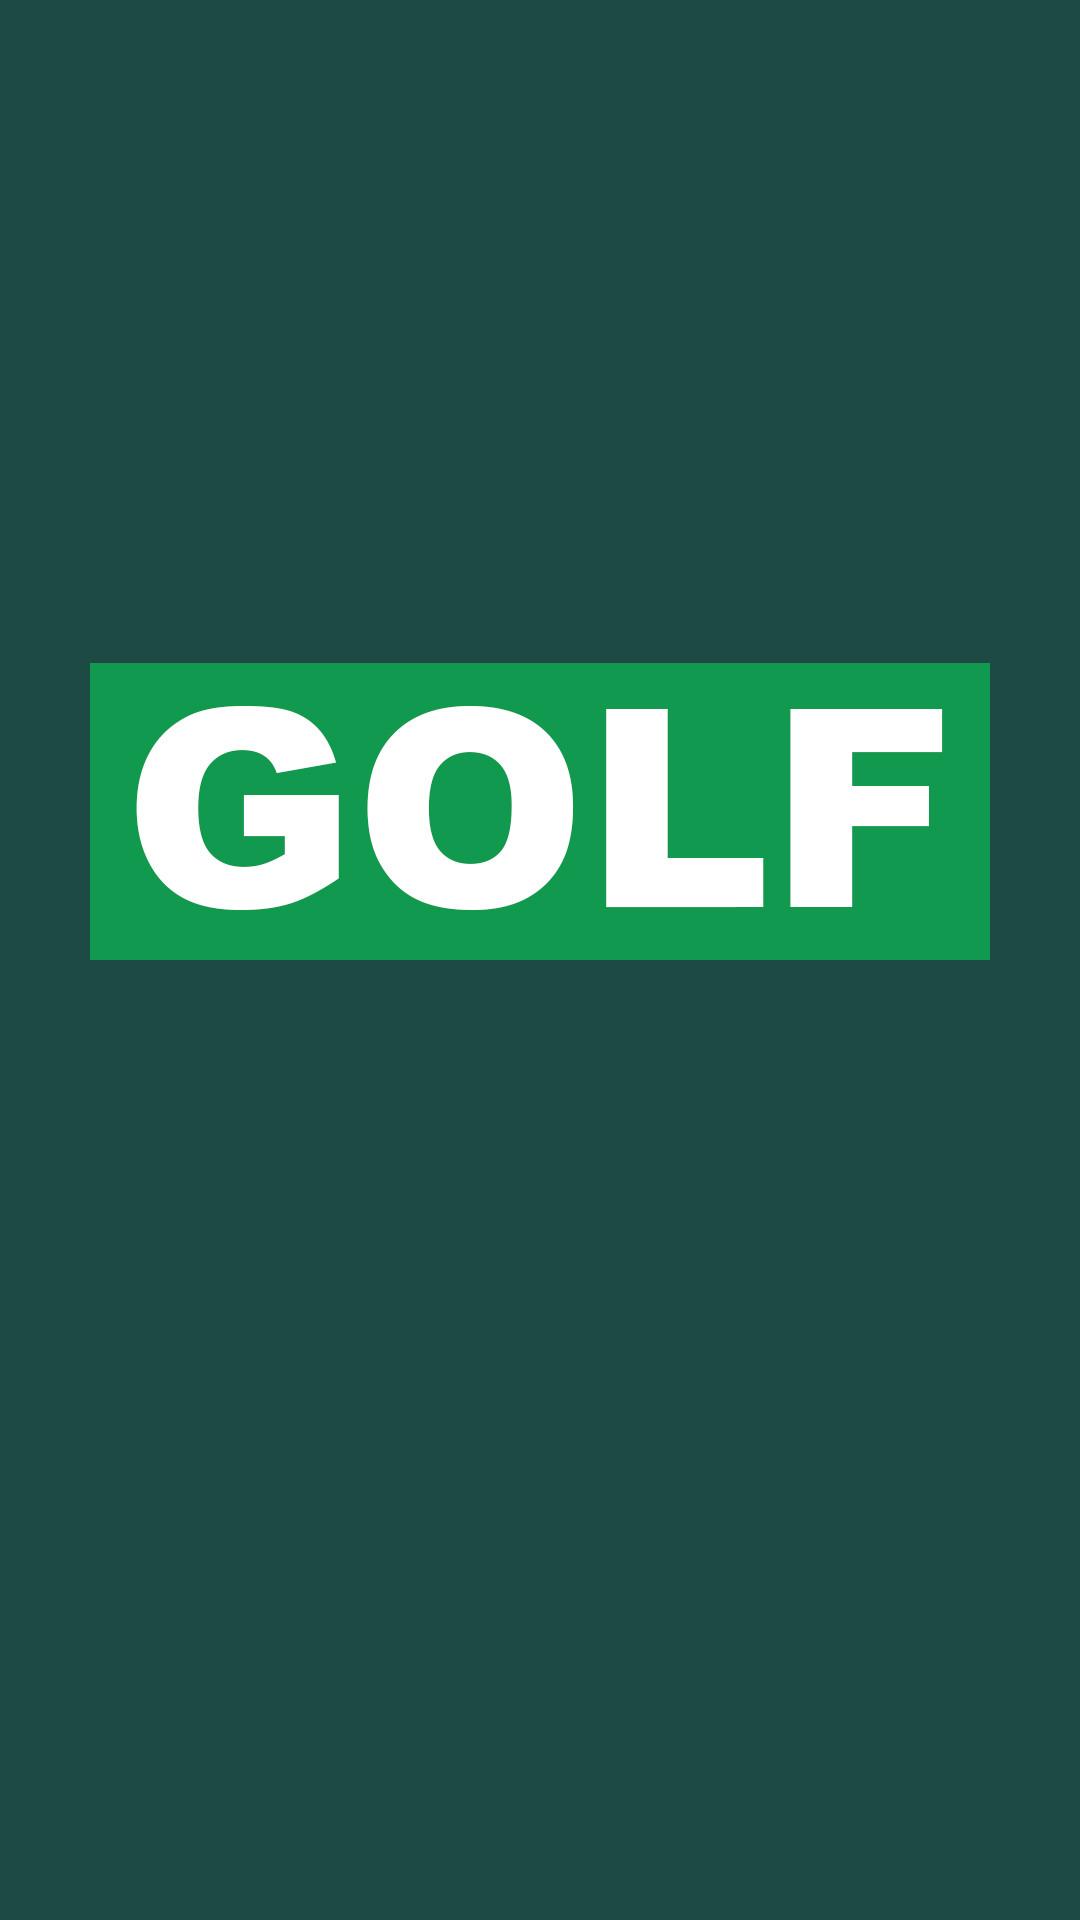 Golfwang Wallpapers 2-2-16